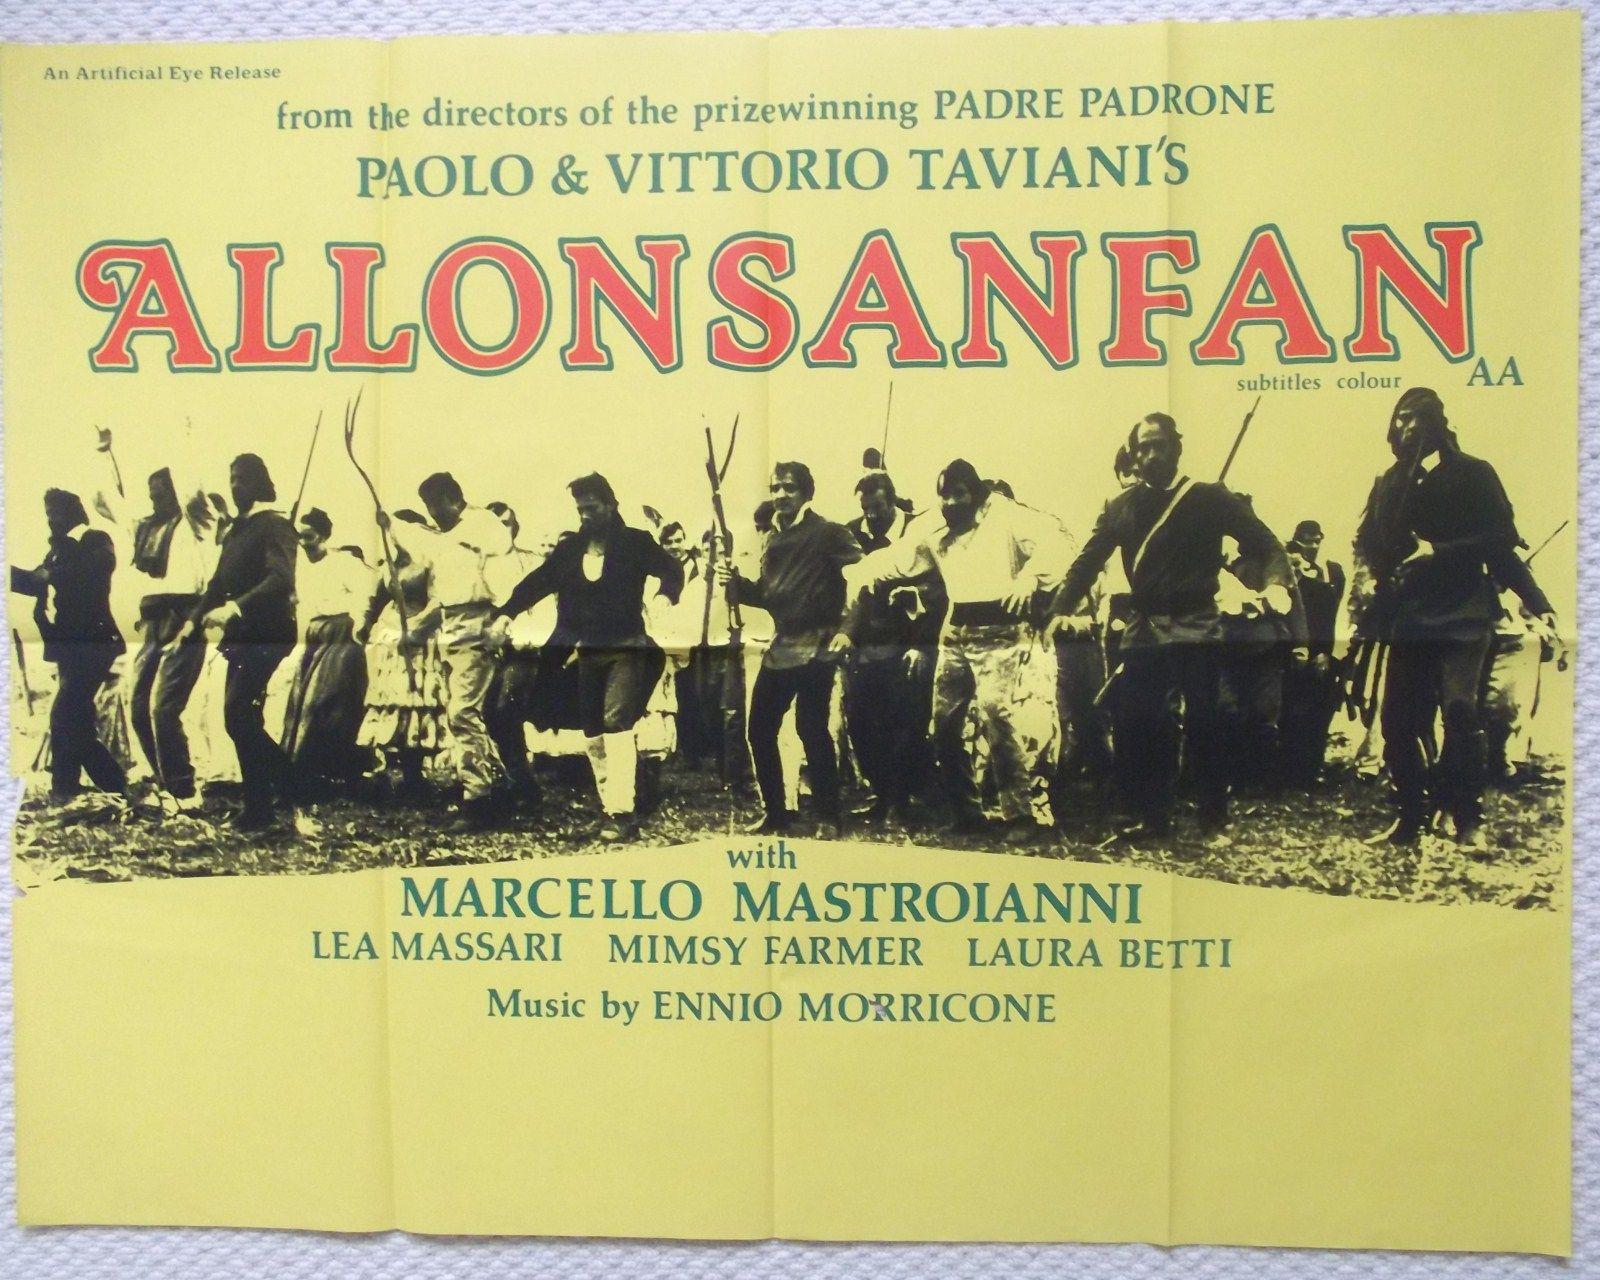 ALLONSANFAN - Πάολο και Βιτόριο Ταβιάνι (η ταινία)